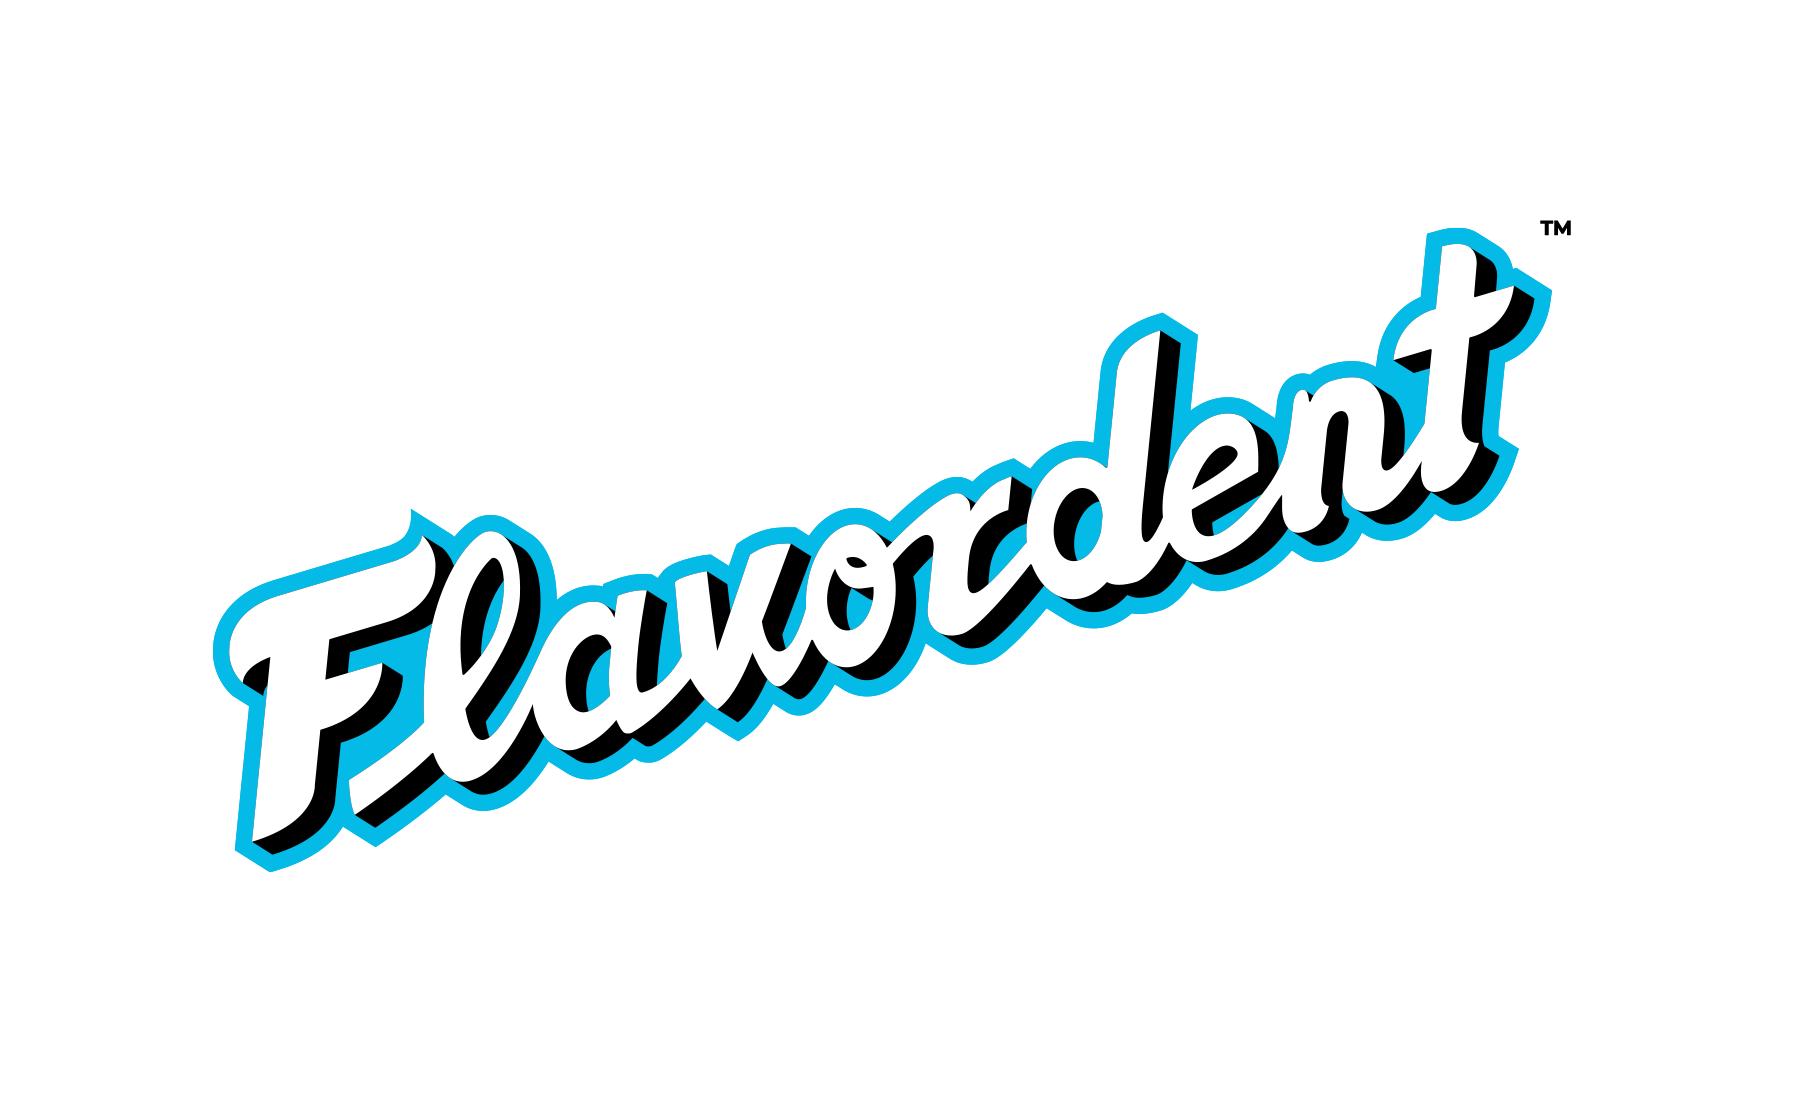 Flavordent Logo Brand Identity Bionic Egg